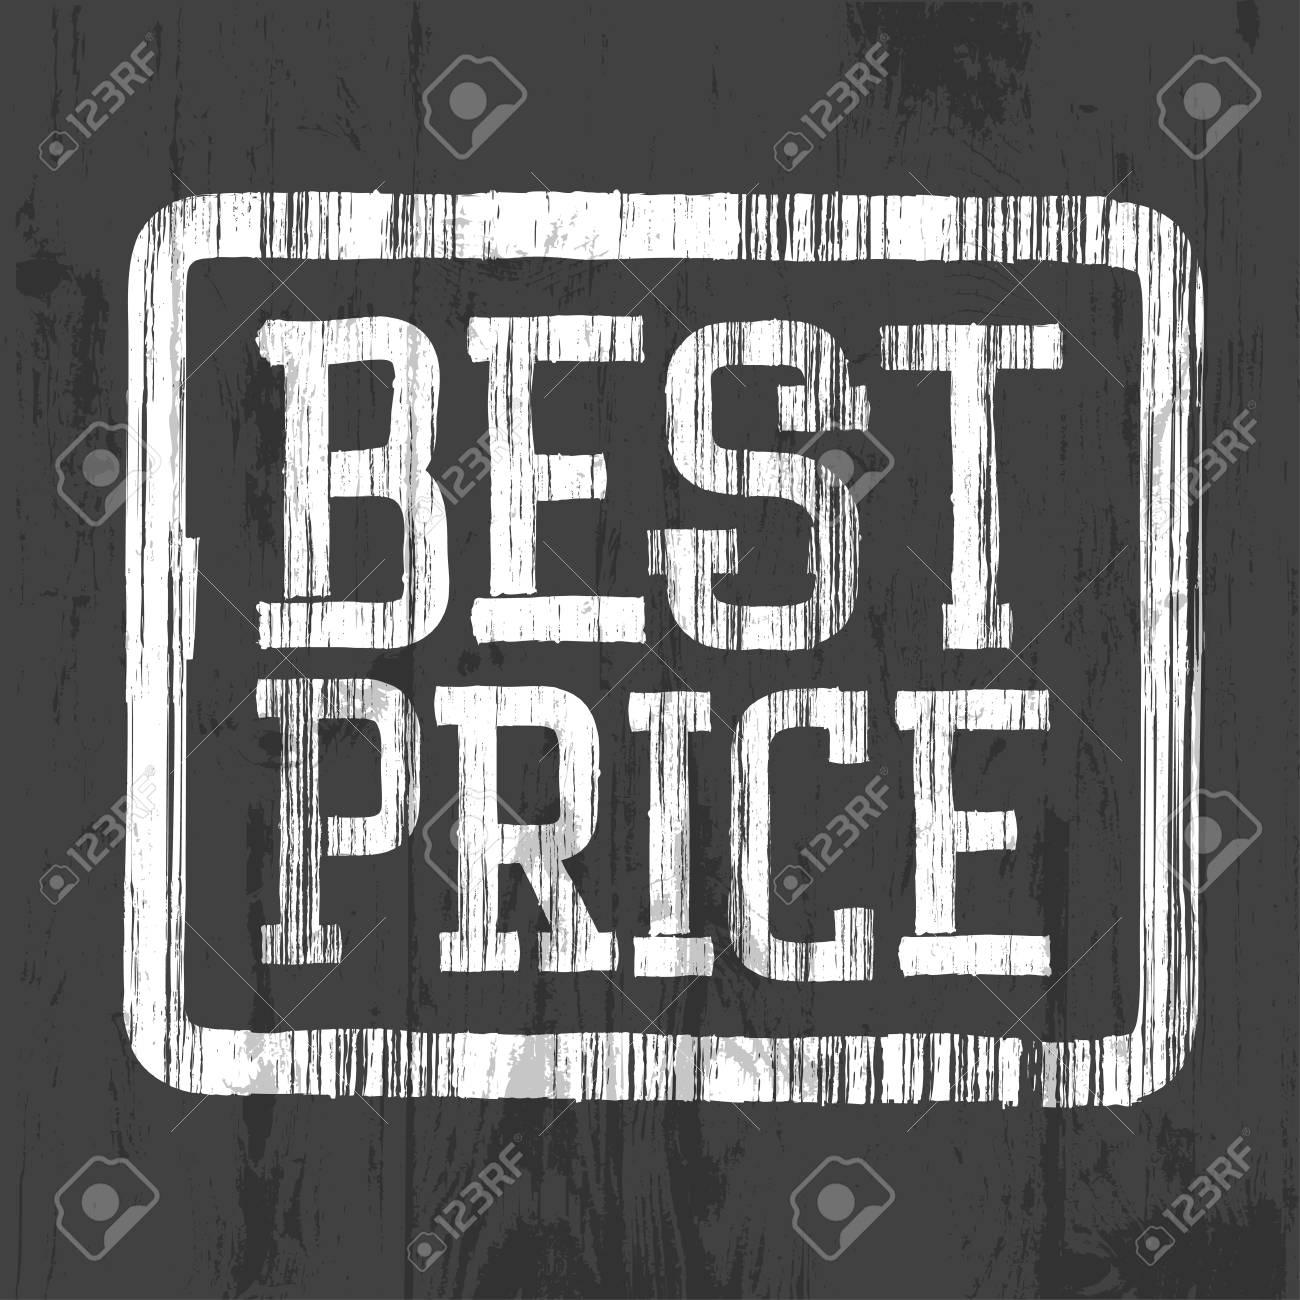 Best price stamp. Stock Vector - 20145960